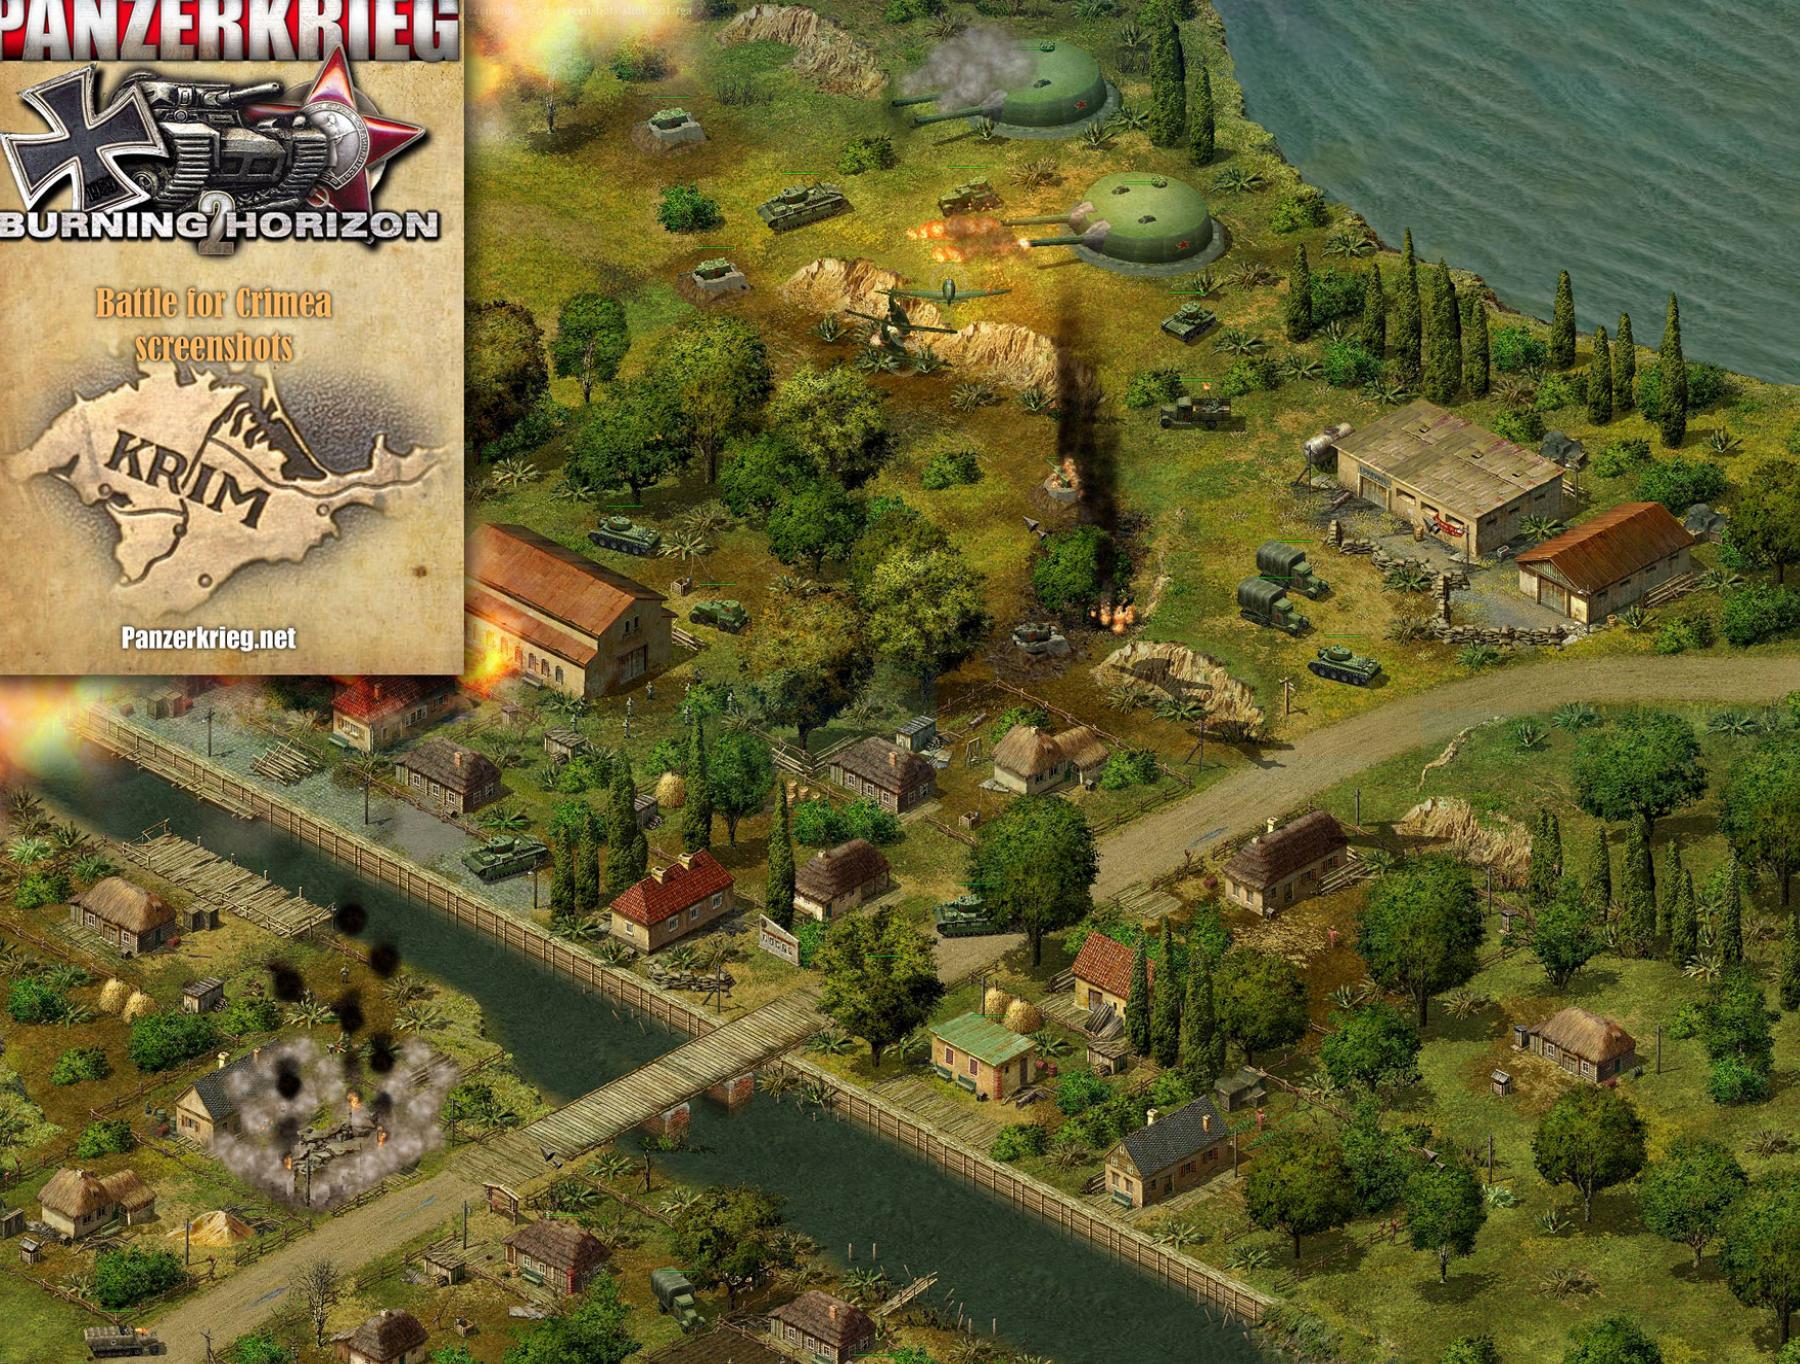 http://www.igroport.ru/games_img/67998_panzerkrieg_burning_horizon_2-5.jpg